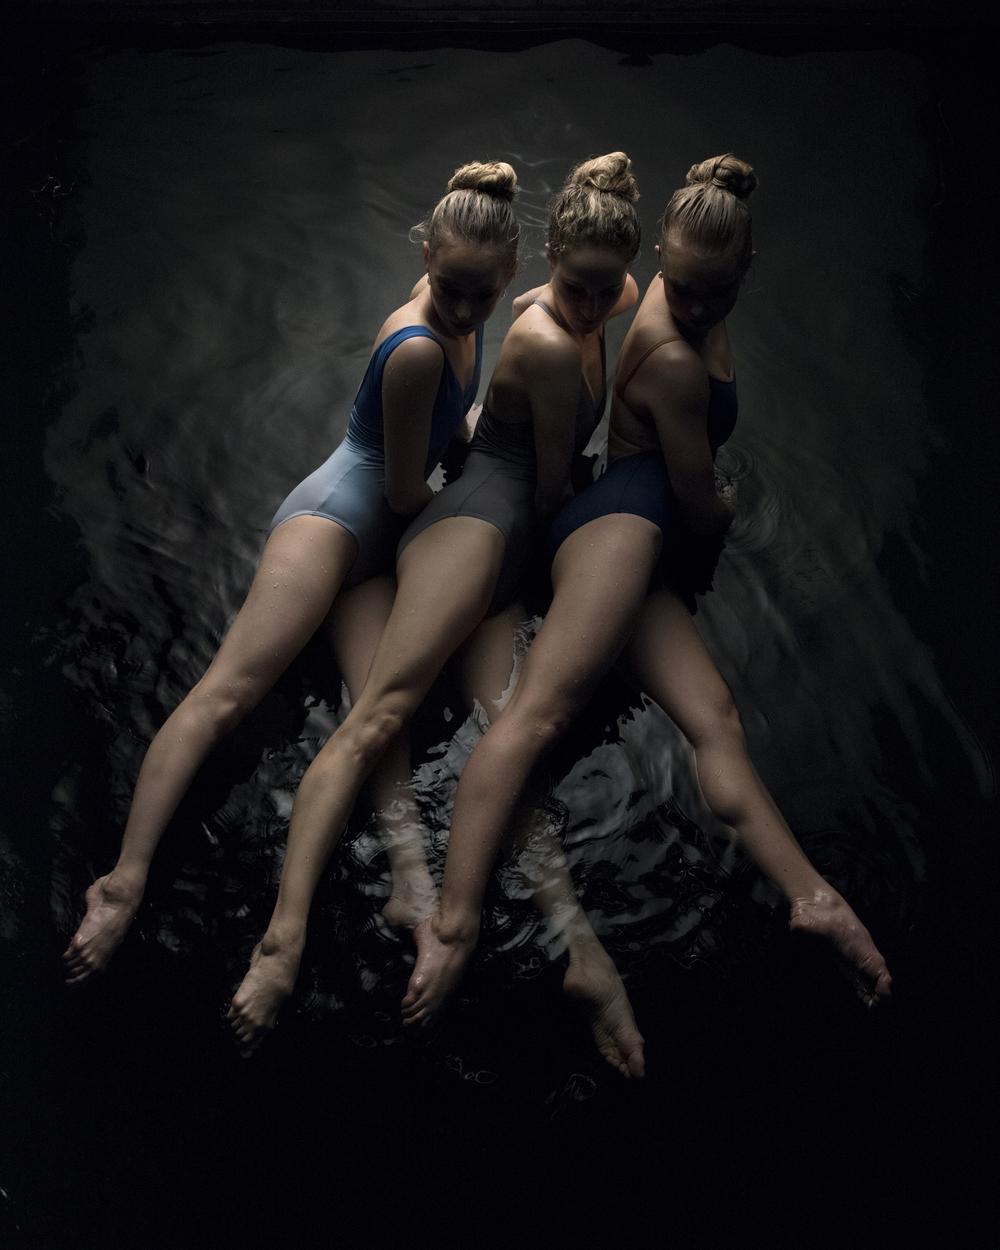 3 GIRLS PRINT MASTER.jpg